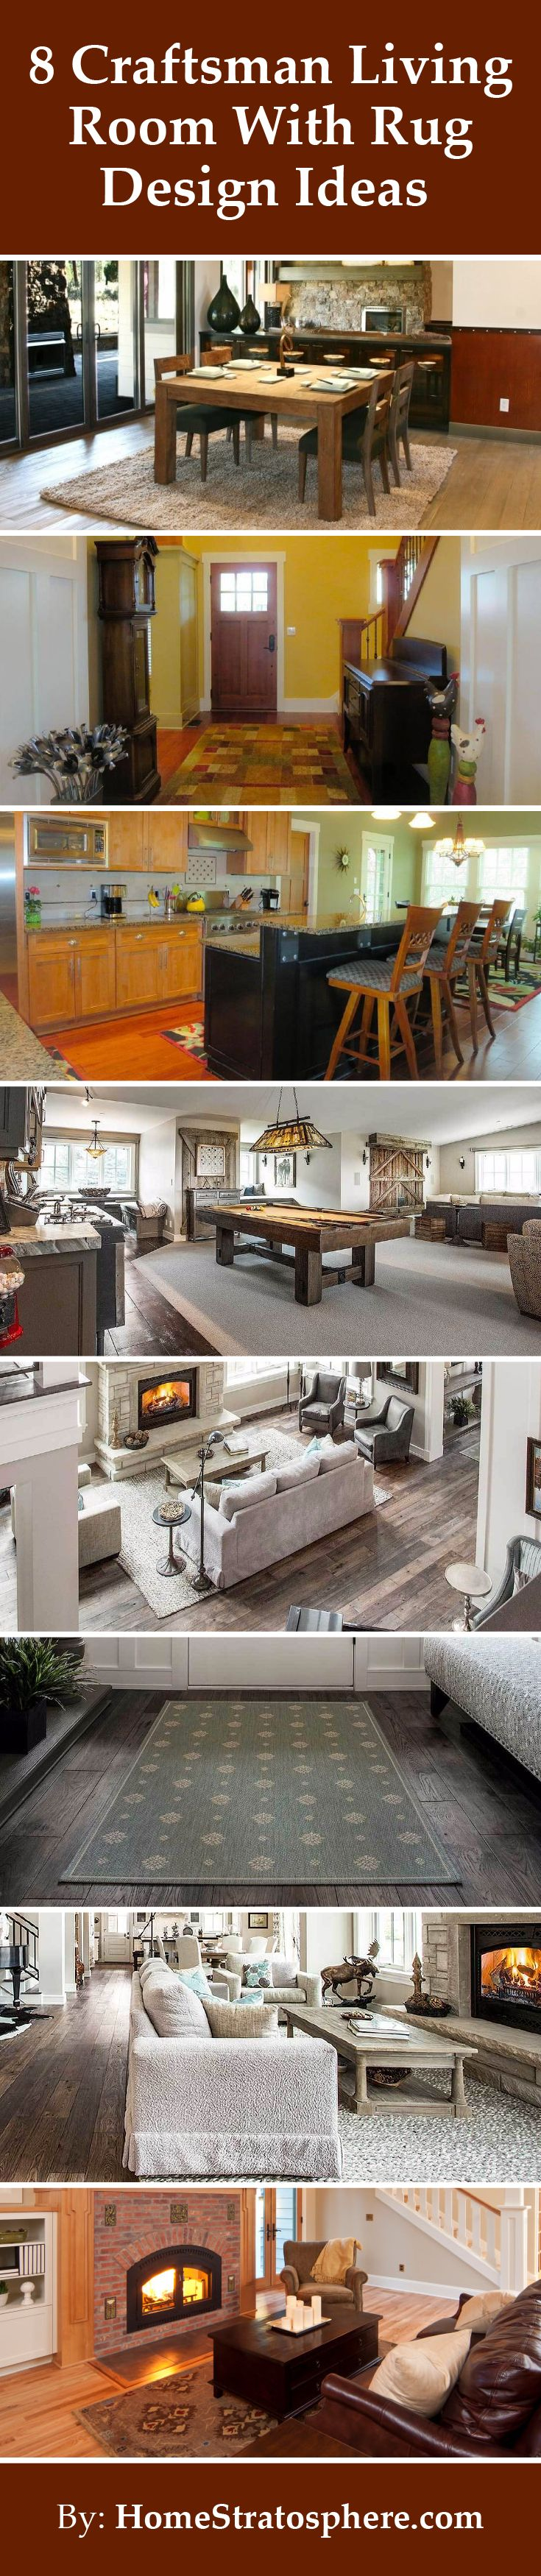 1748 best living room ideas images on pinterest | living room